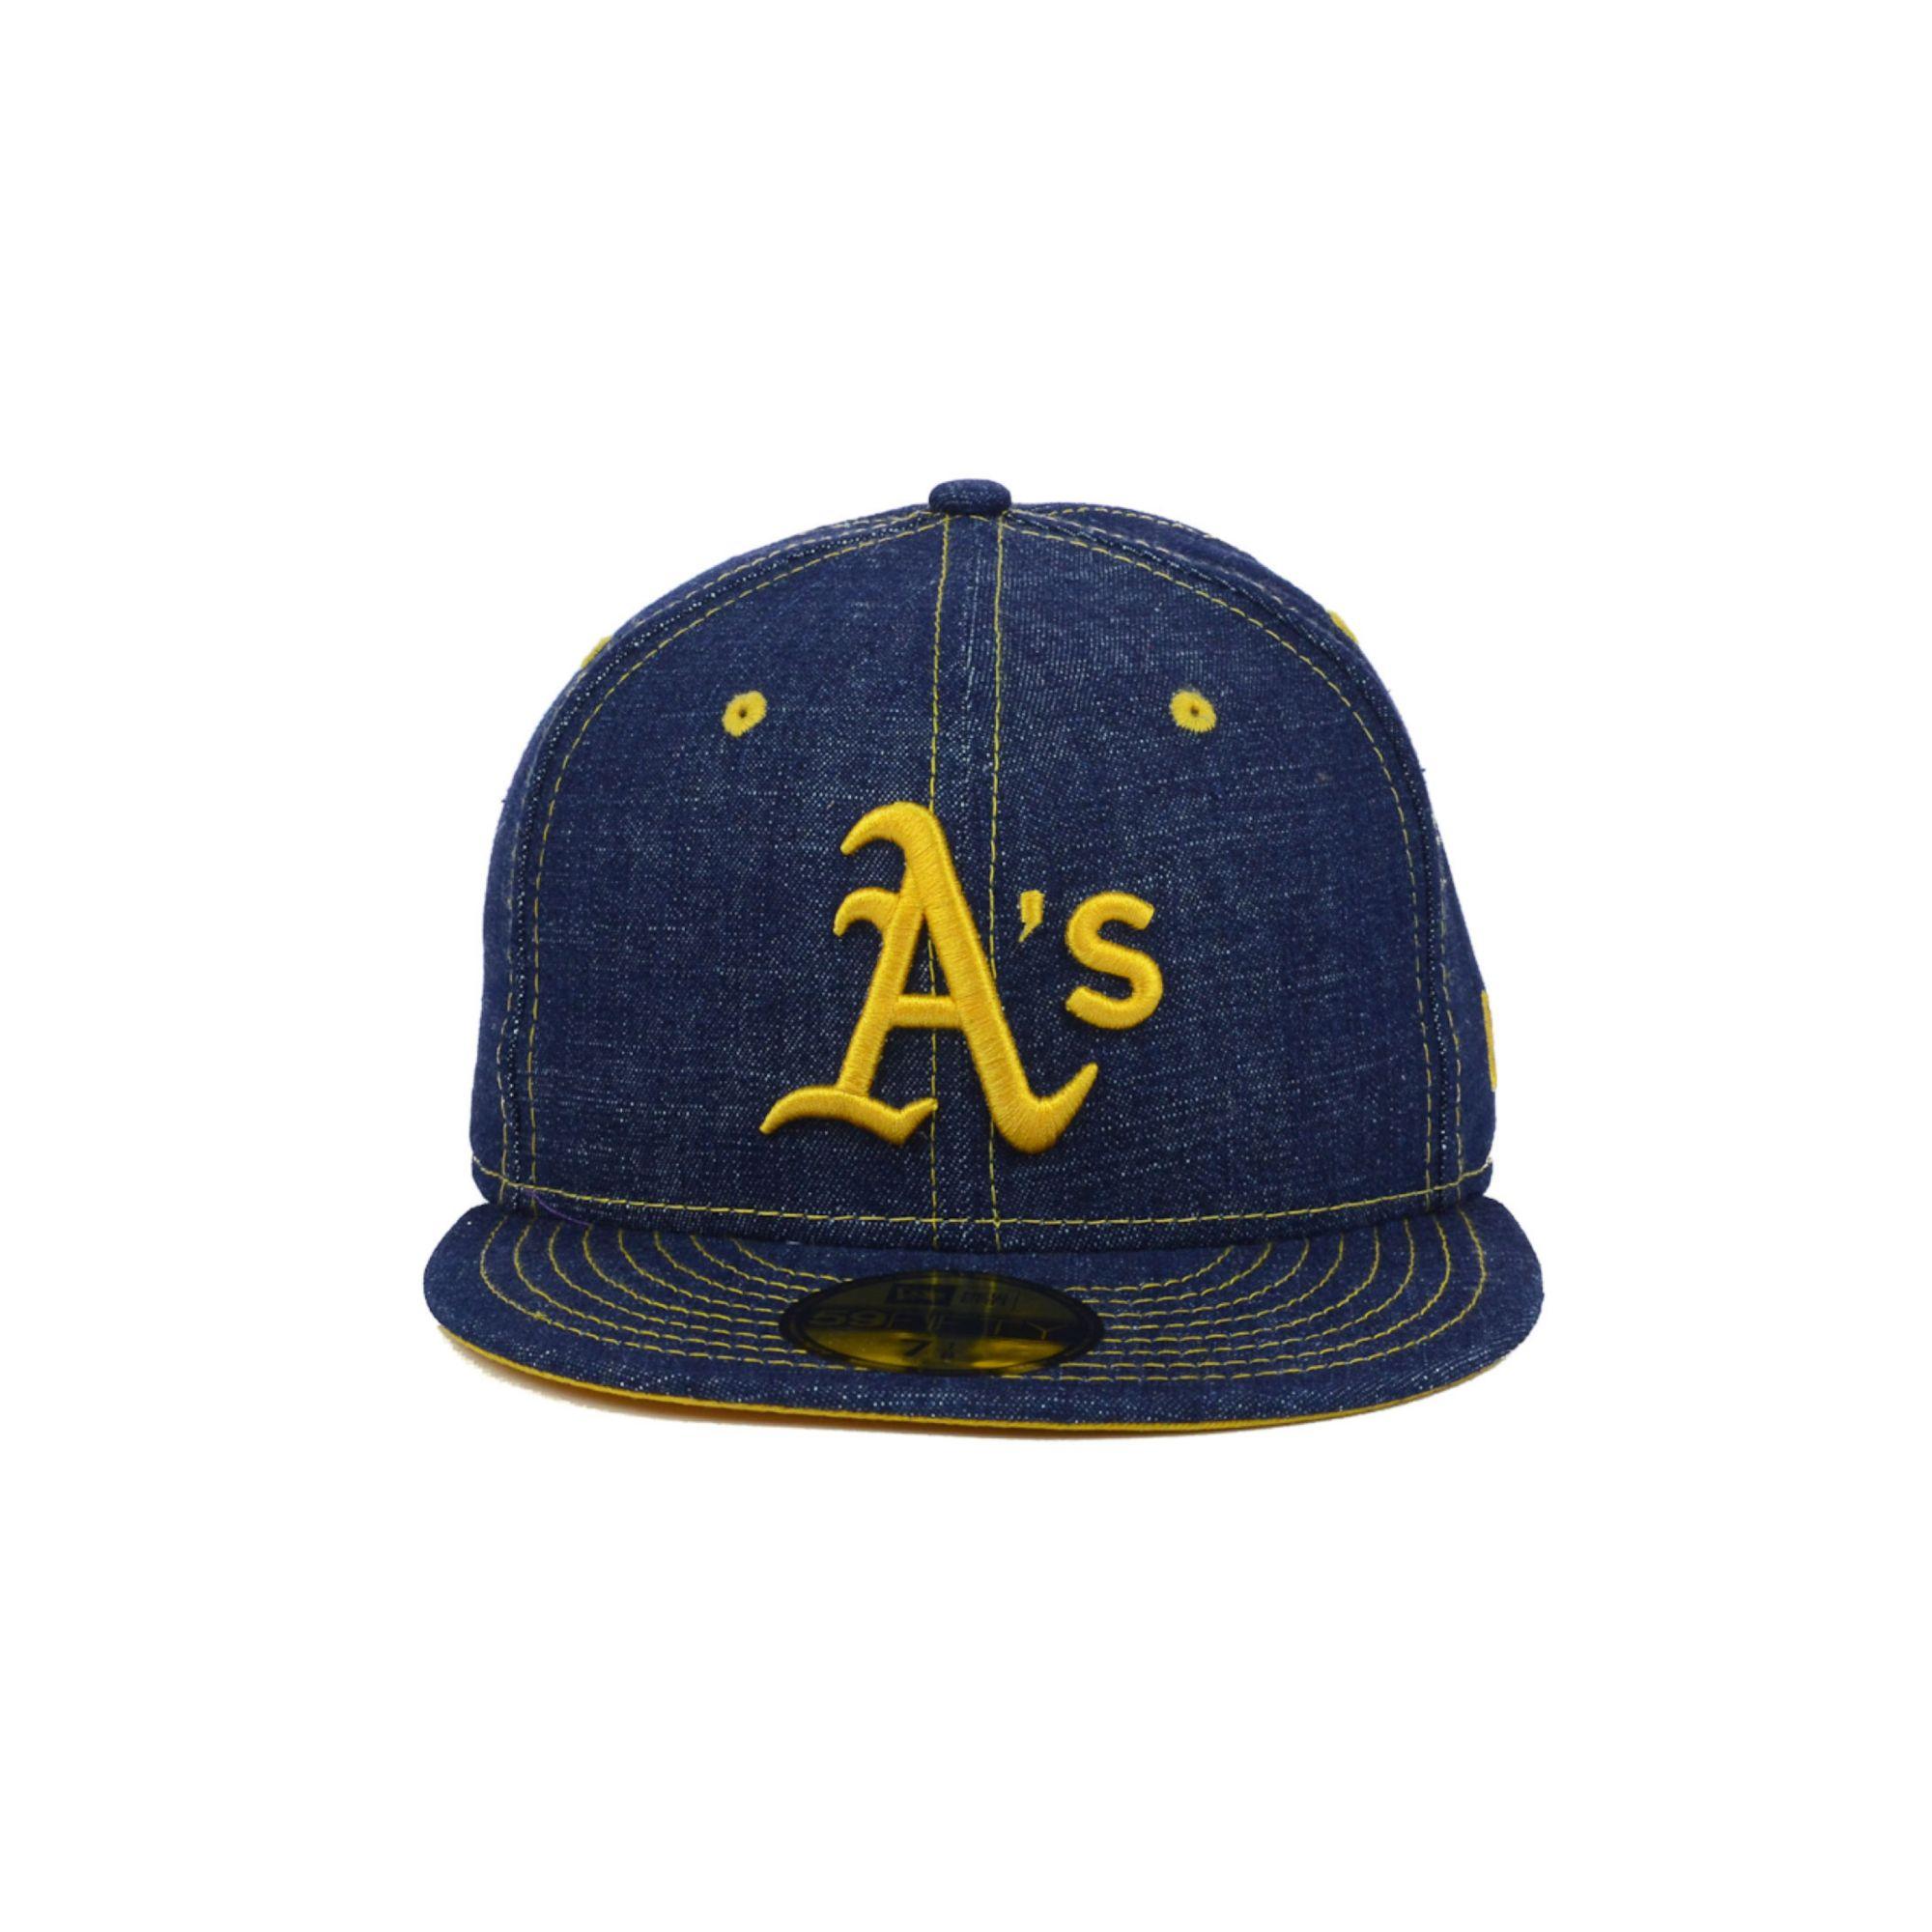 fa6ded4a08f ... top quality oakland athletics hats lyst ktz oakland athletics mlb  classic denim 59fifty cap in blue